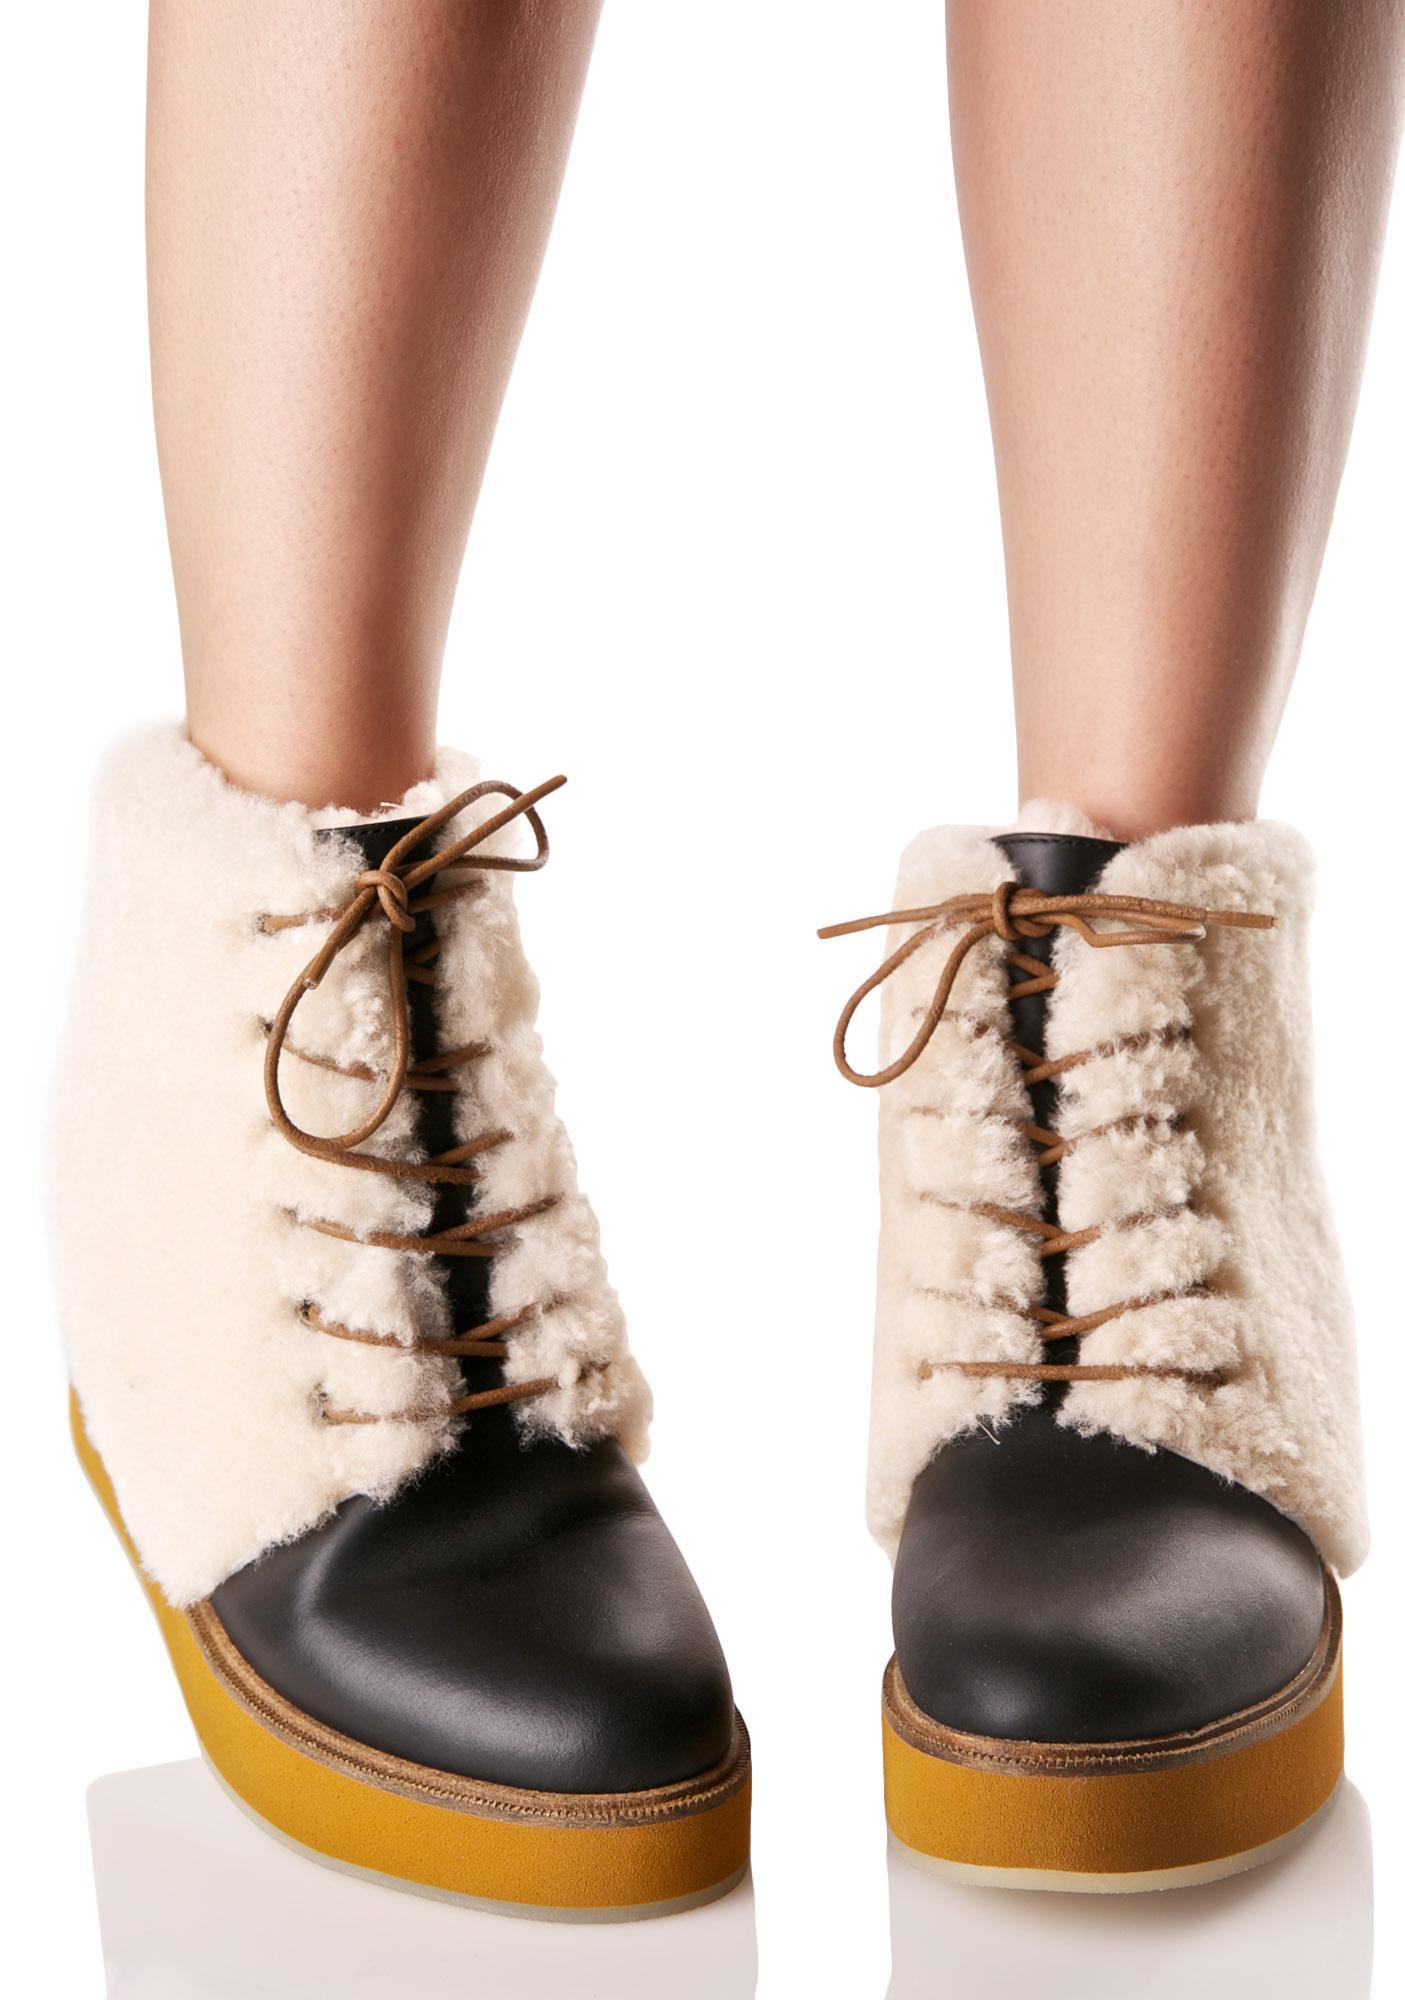 Australia Luxe Collective Bundaburg Boots